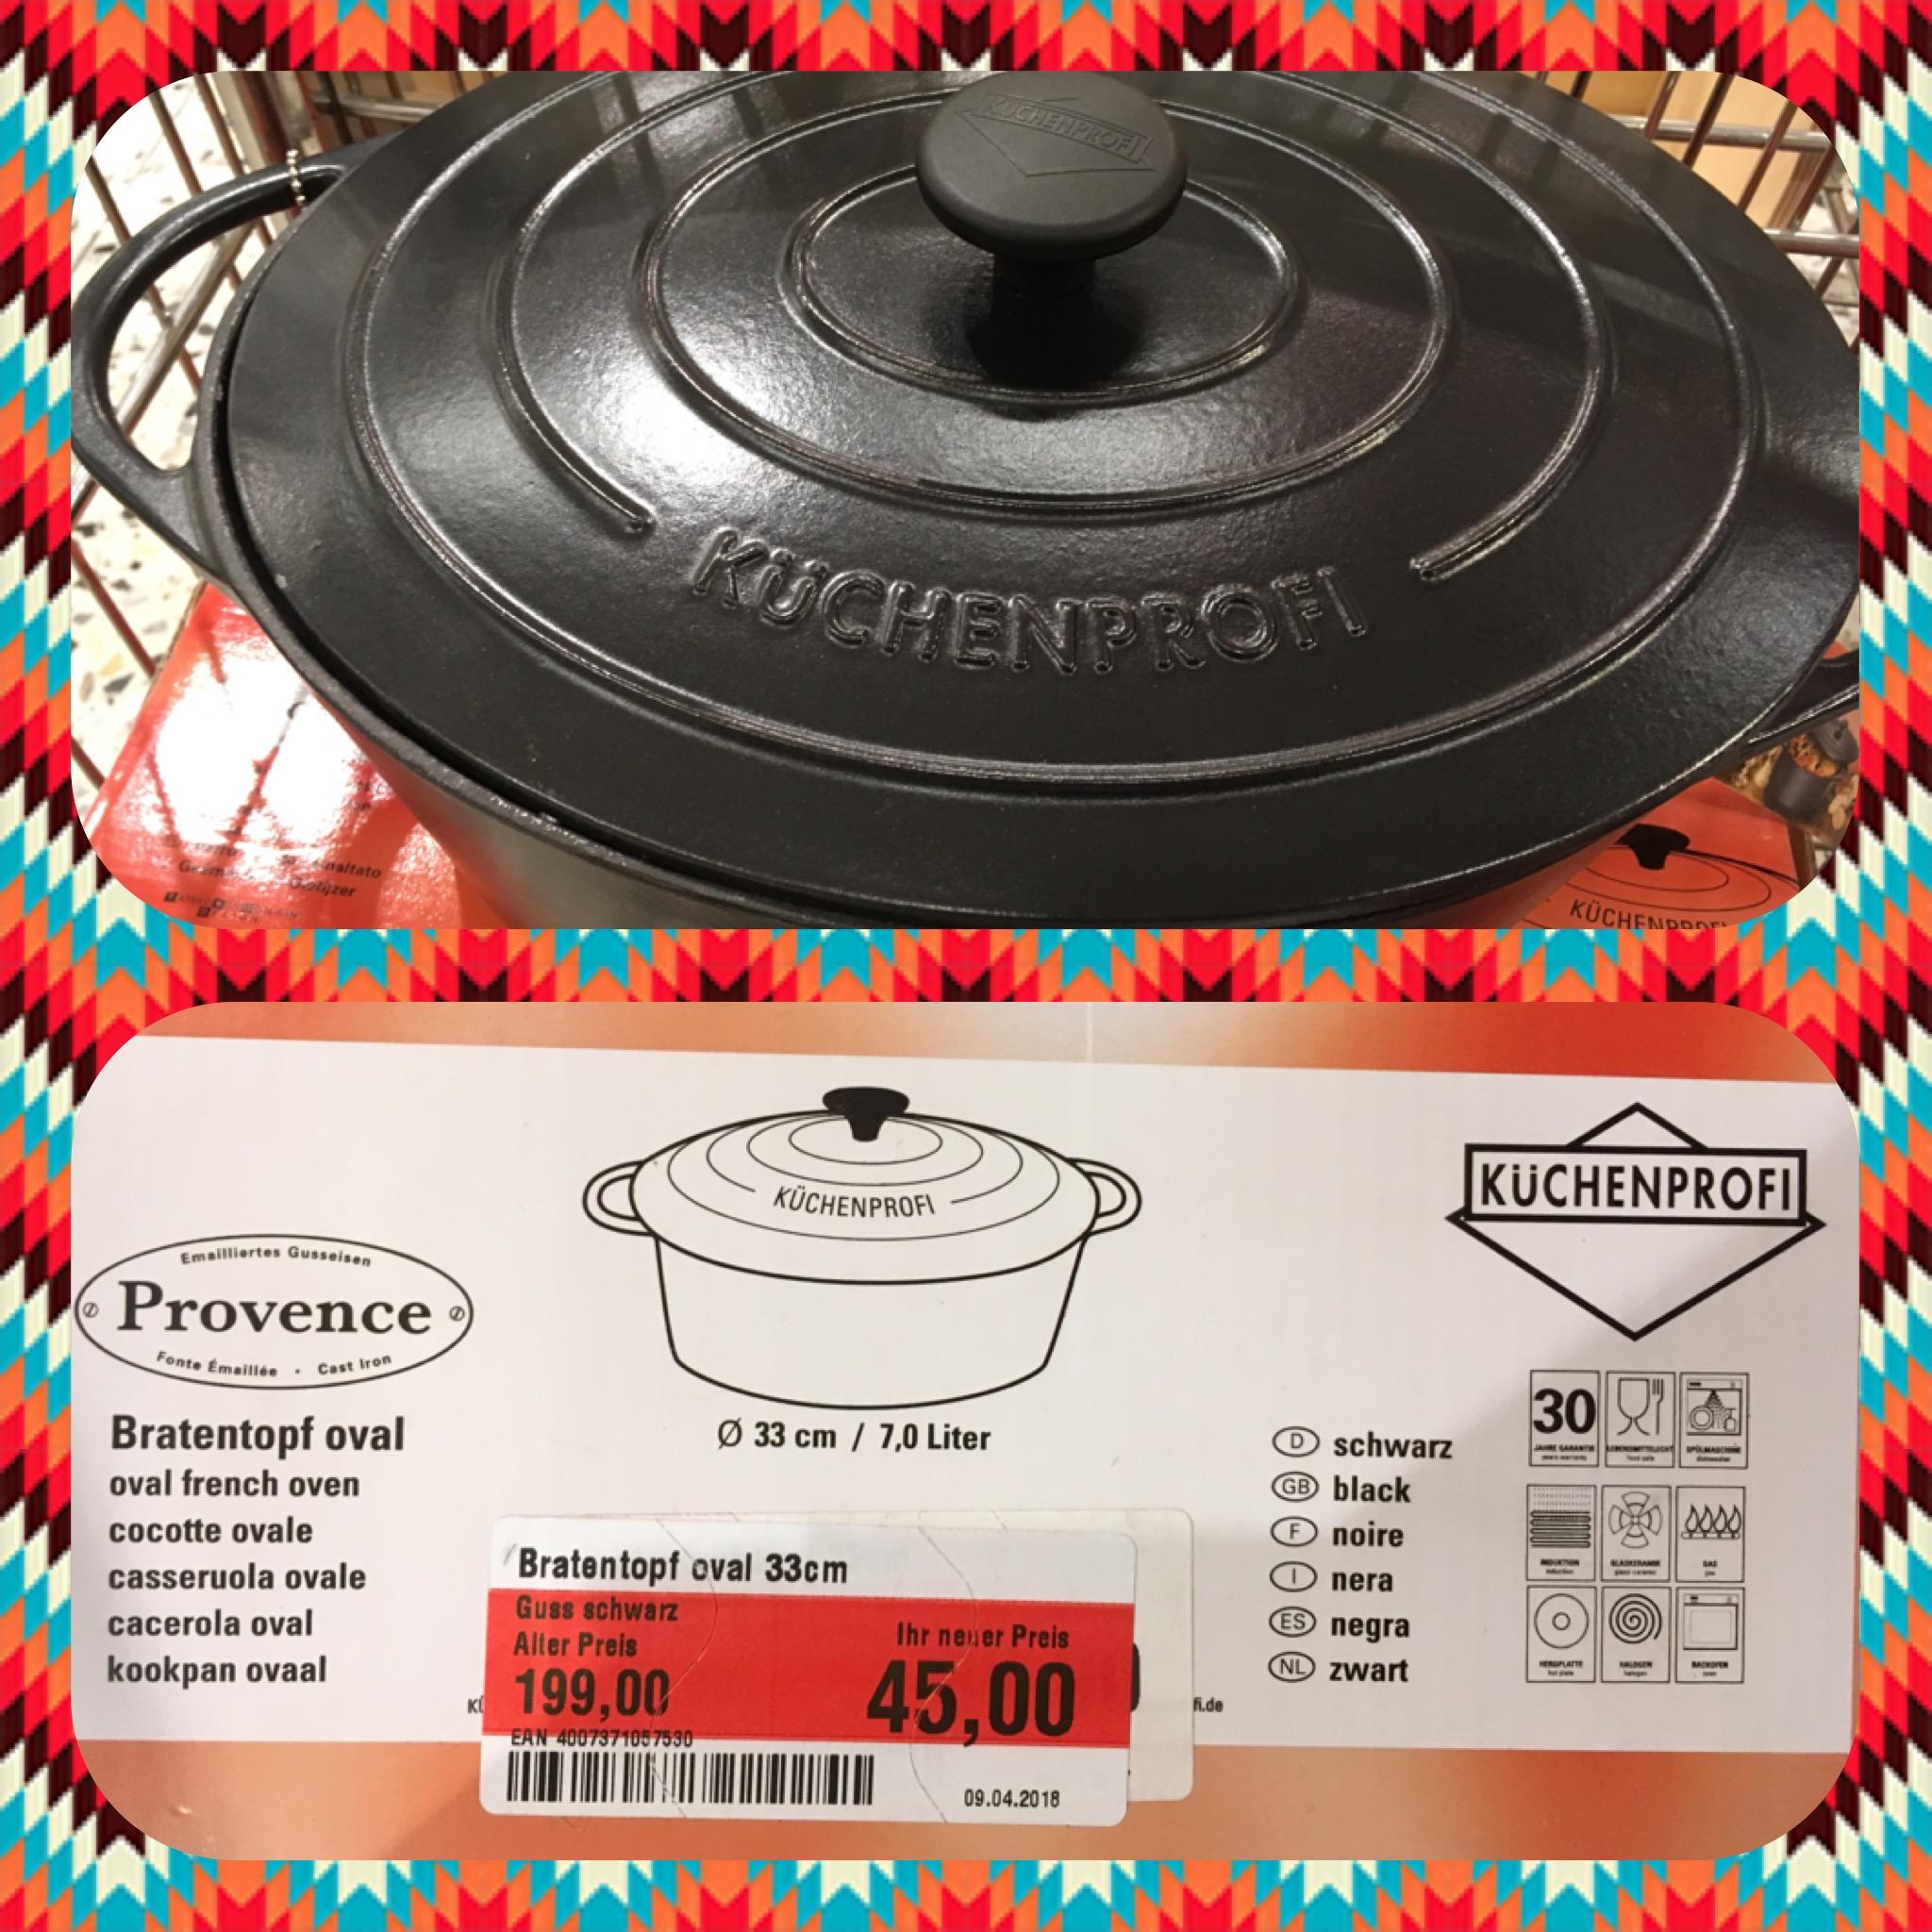 [LOKAL GLOBUS HOCKENHEIM] Küchenprofi Bratentopf oval, 33cm, 7L, Gusseisen